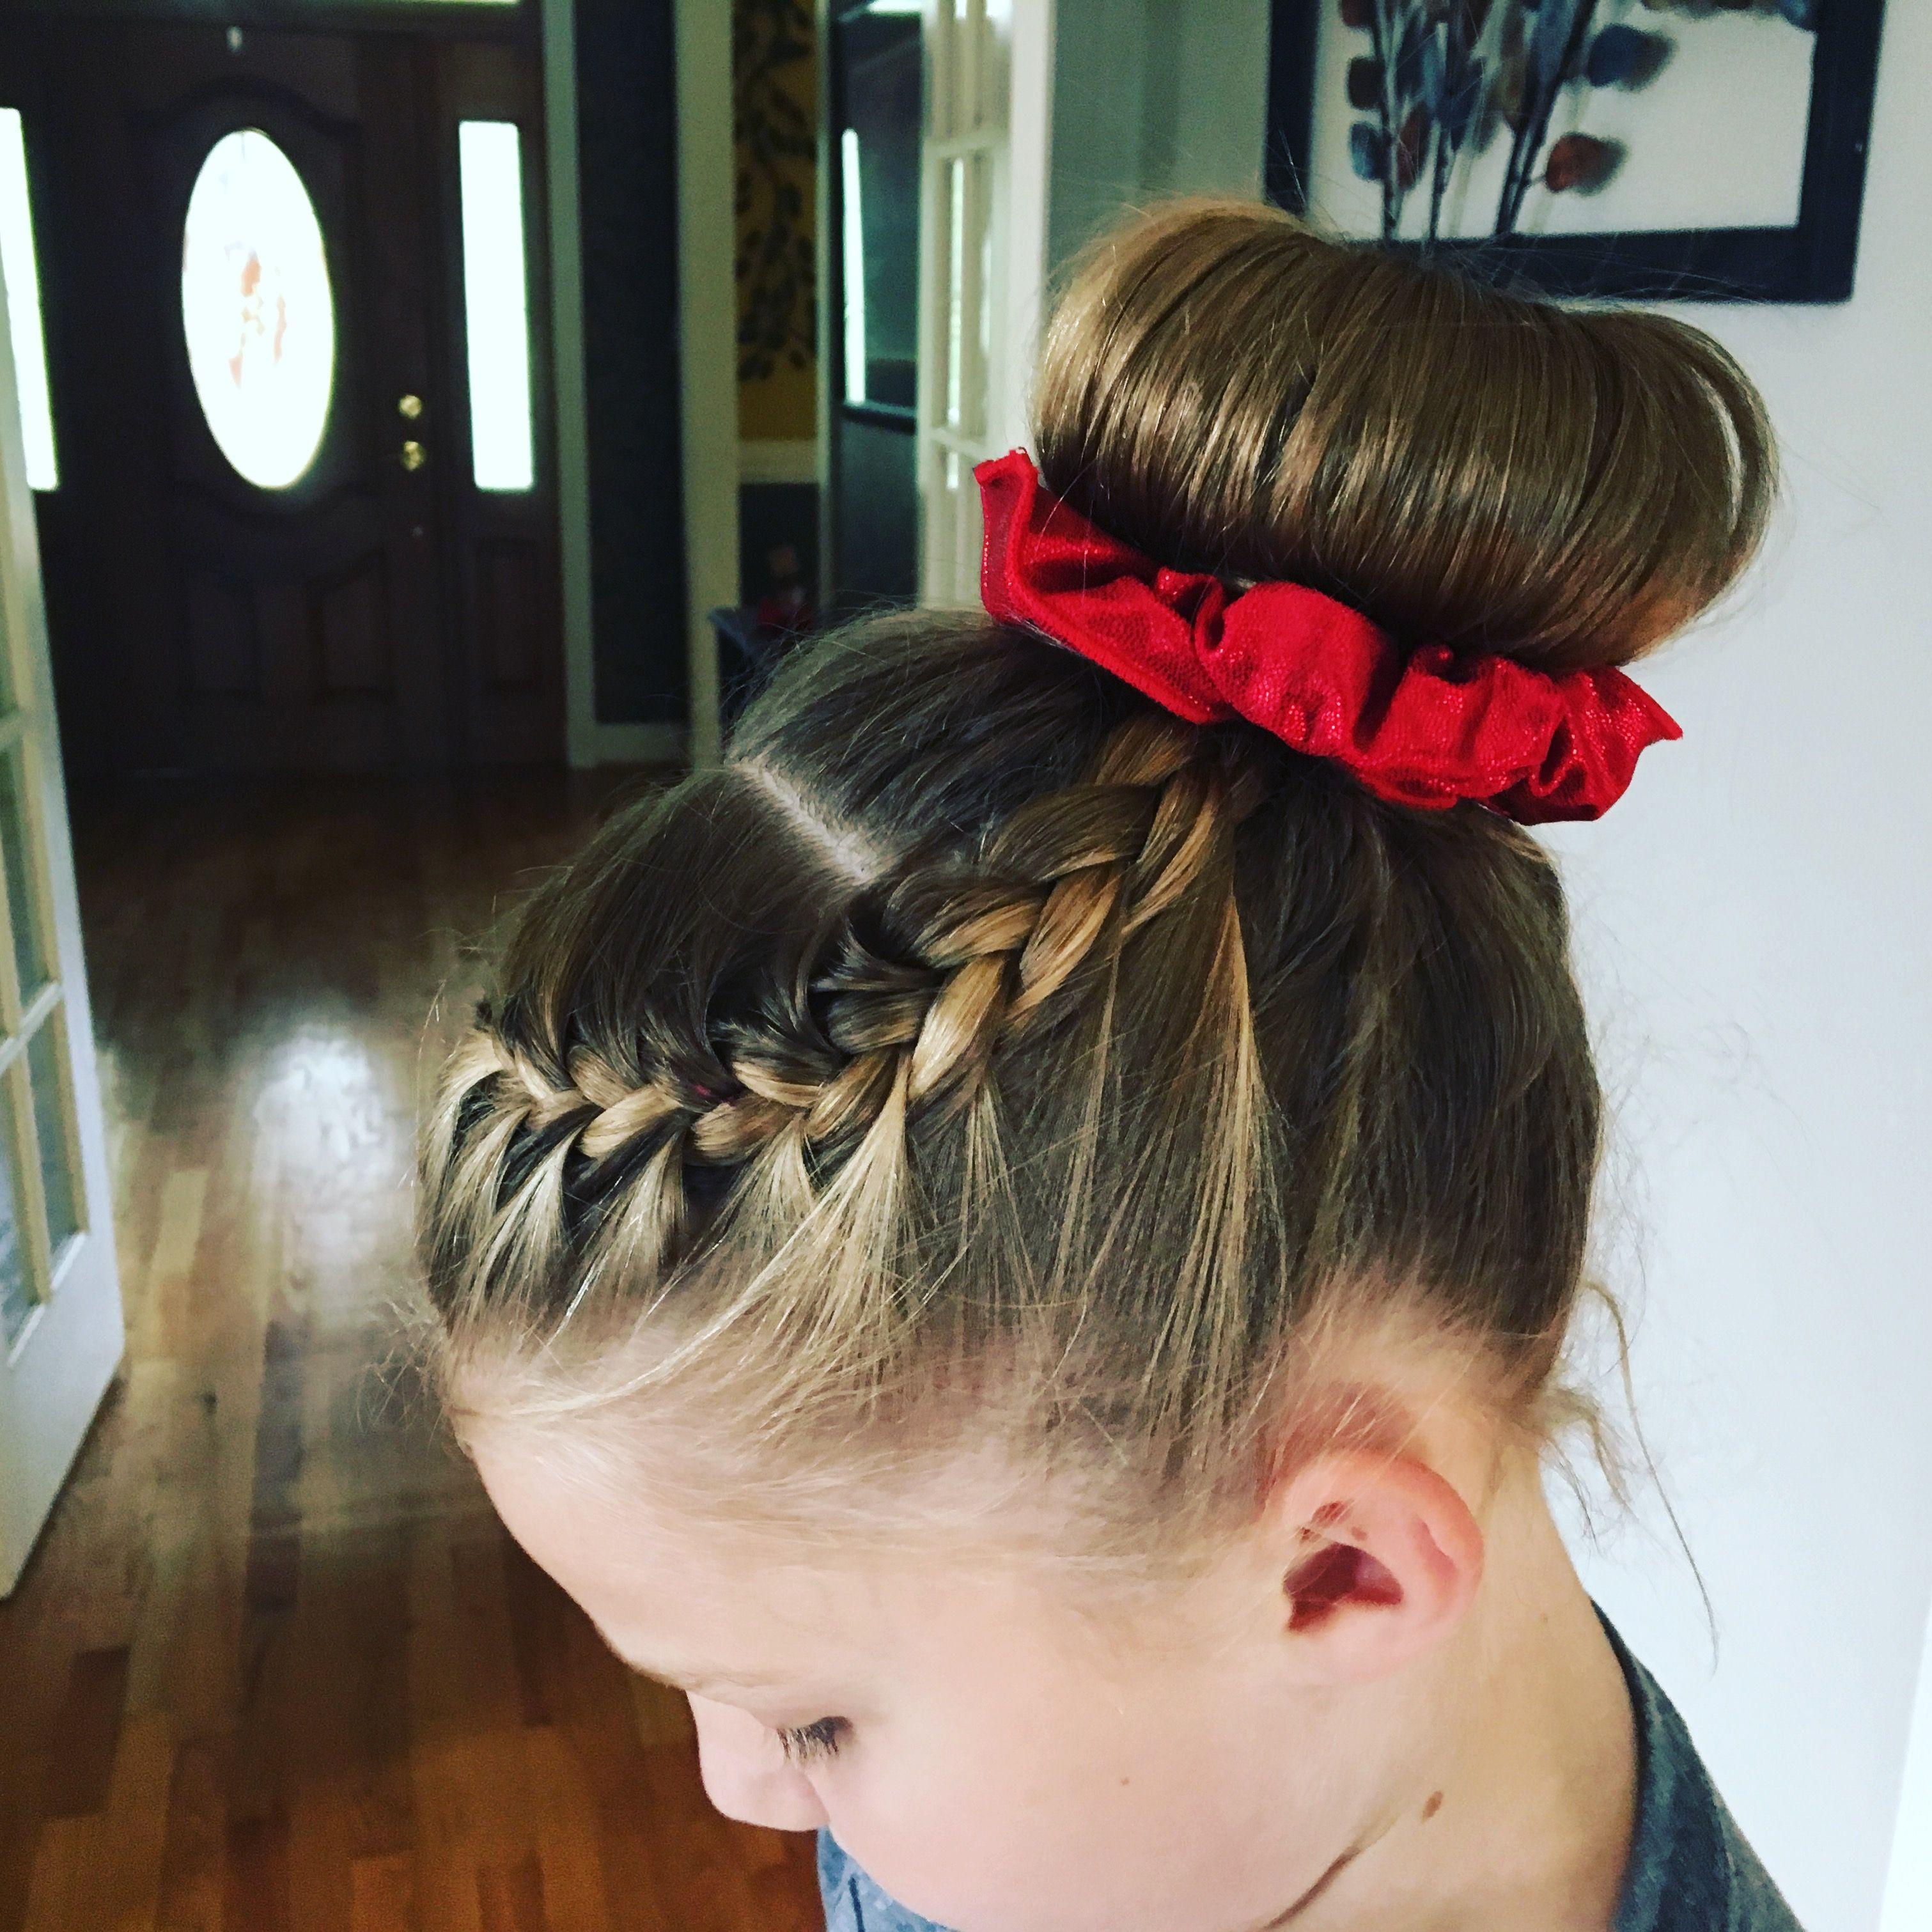 Gymnastics Hair Side Braid Into A Bun Gymnastics Hair Competition Hair Braided Hairstyles Easy